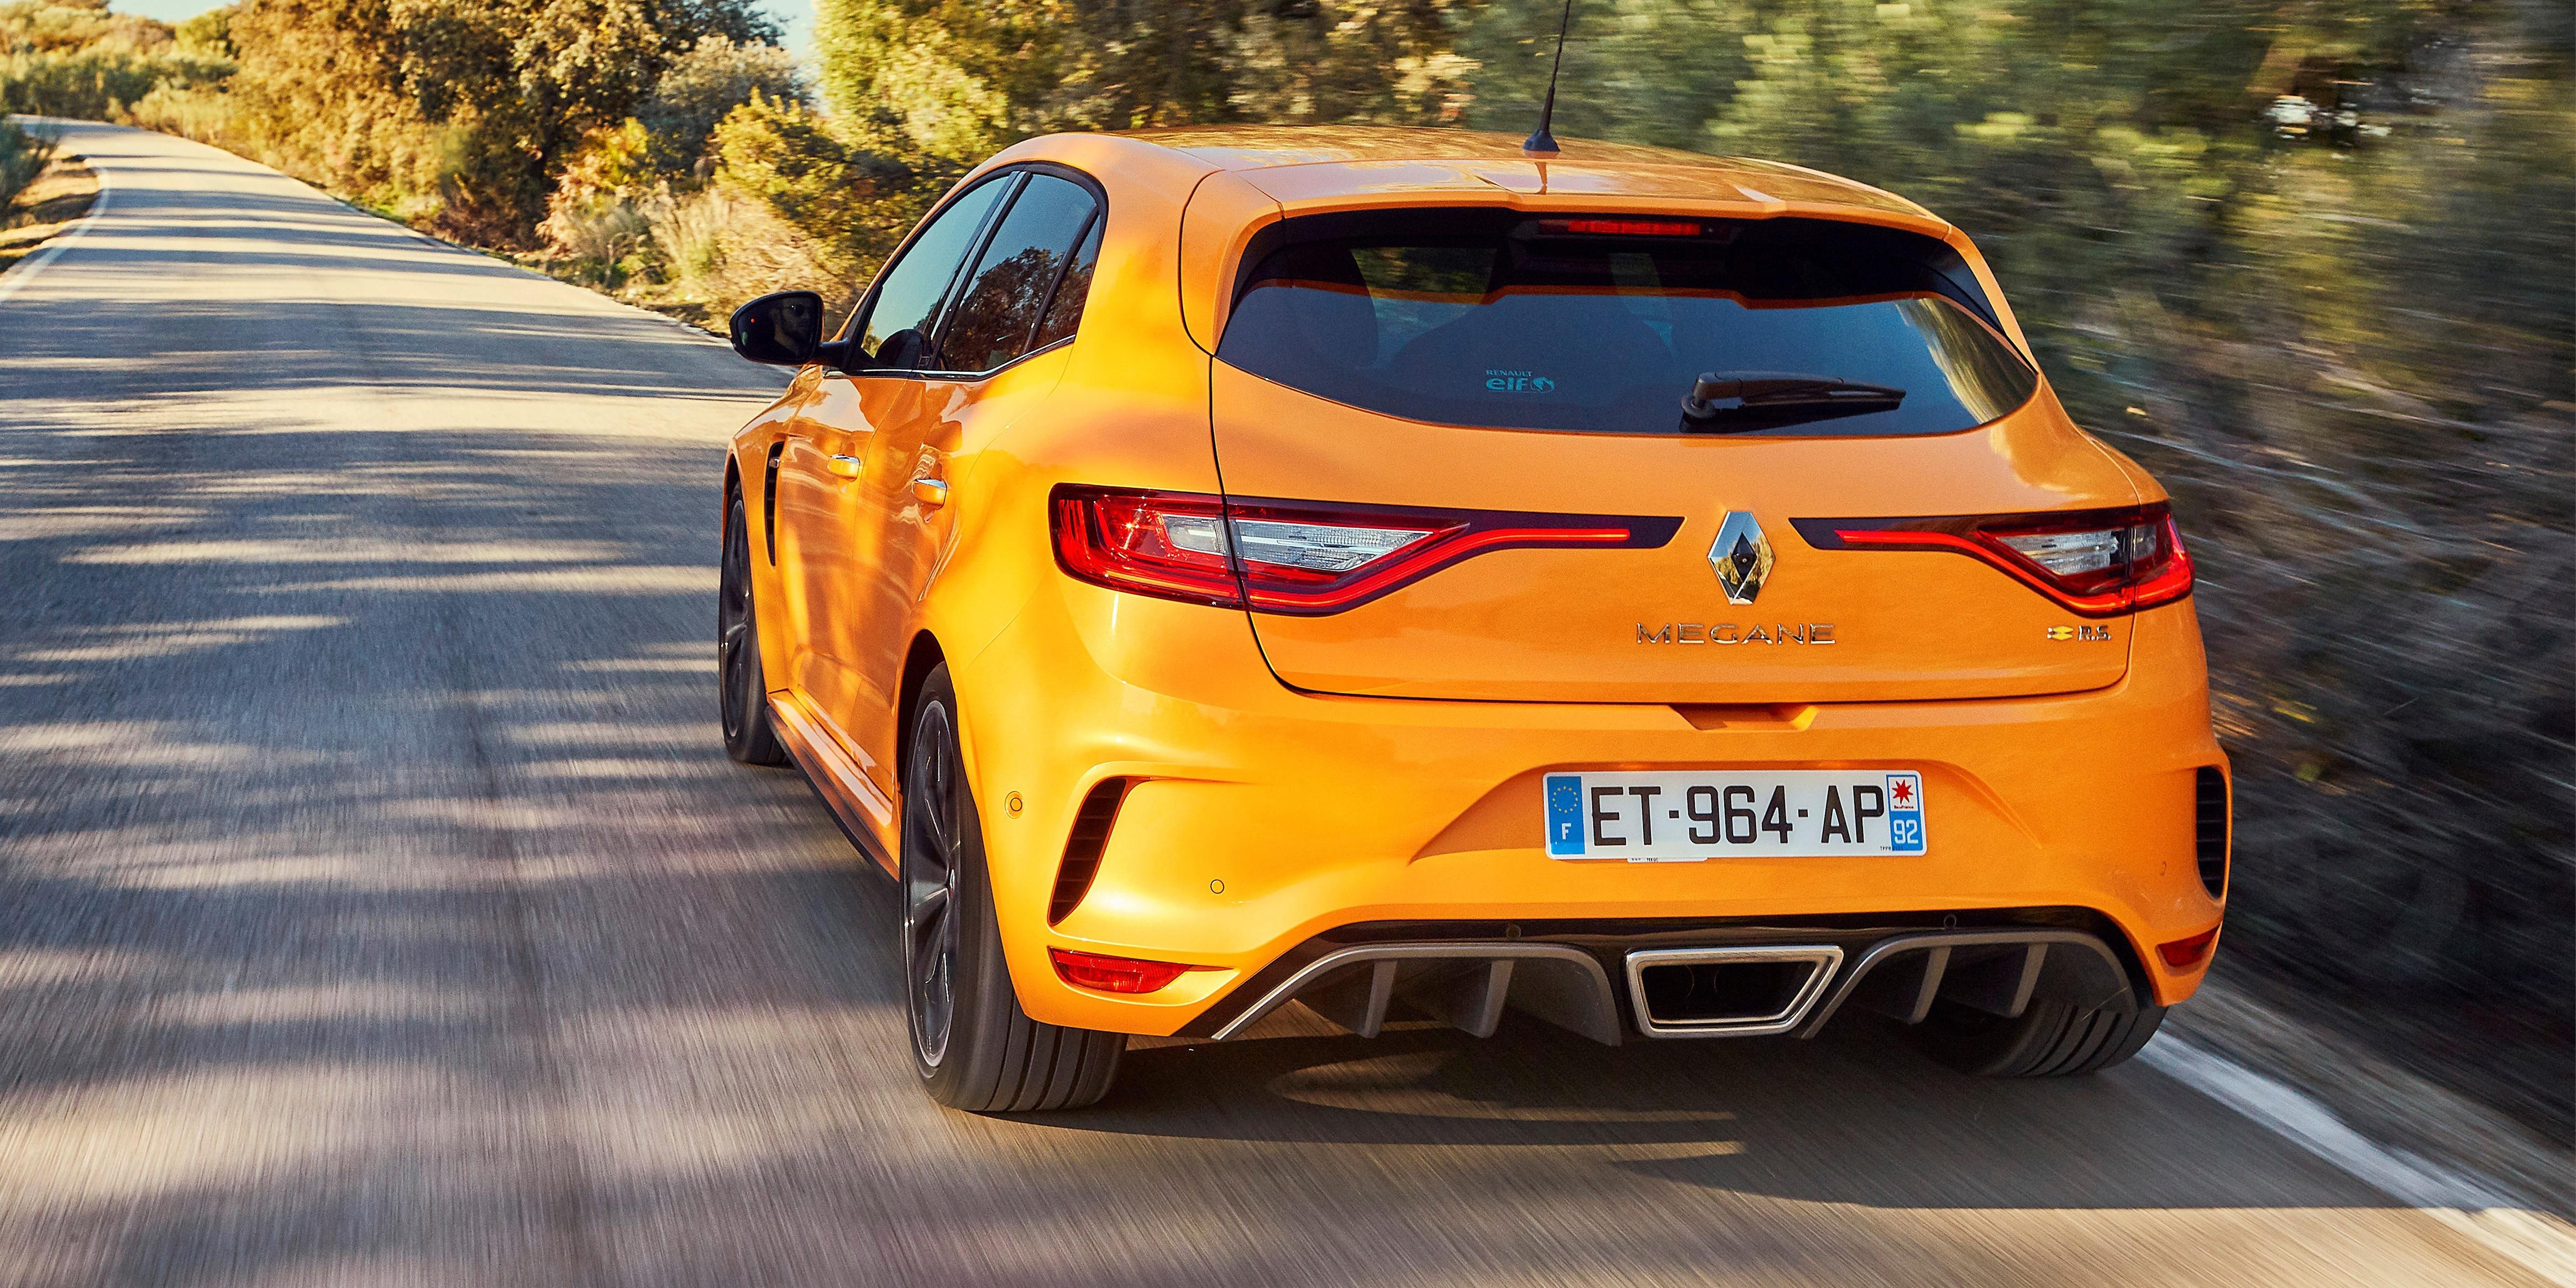 2018 Renault Megane Rs Pricing To Start Around 45 000 Caradvice